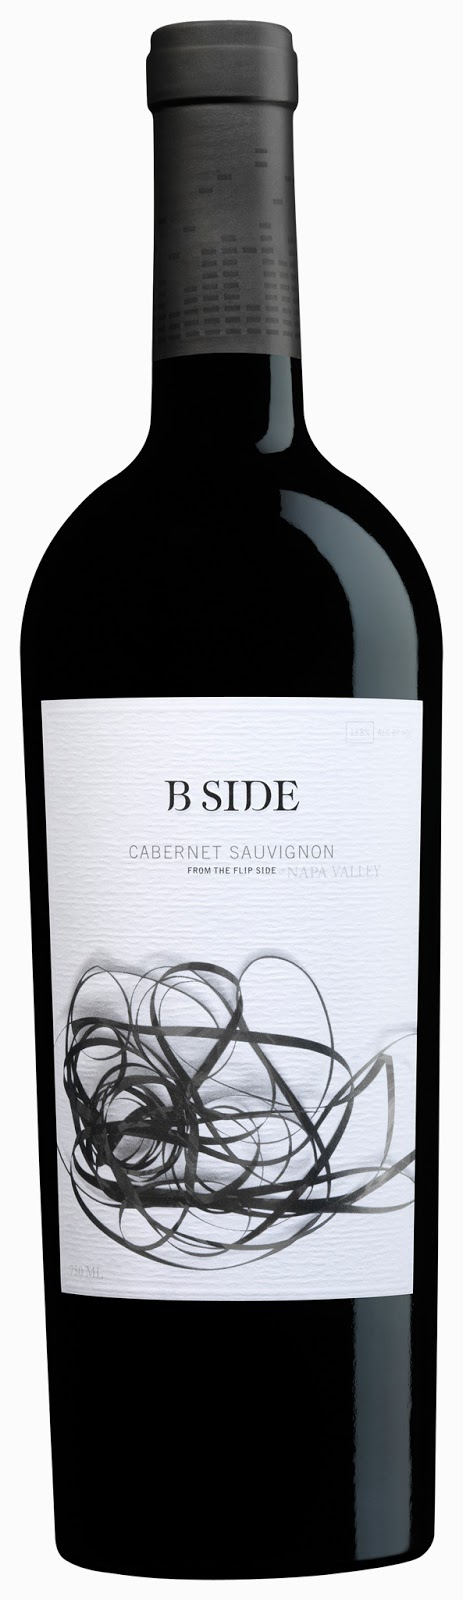 vino napa valley bottiglia design packaging naming etichetta etichette labelling rosso